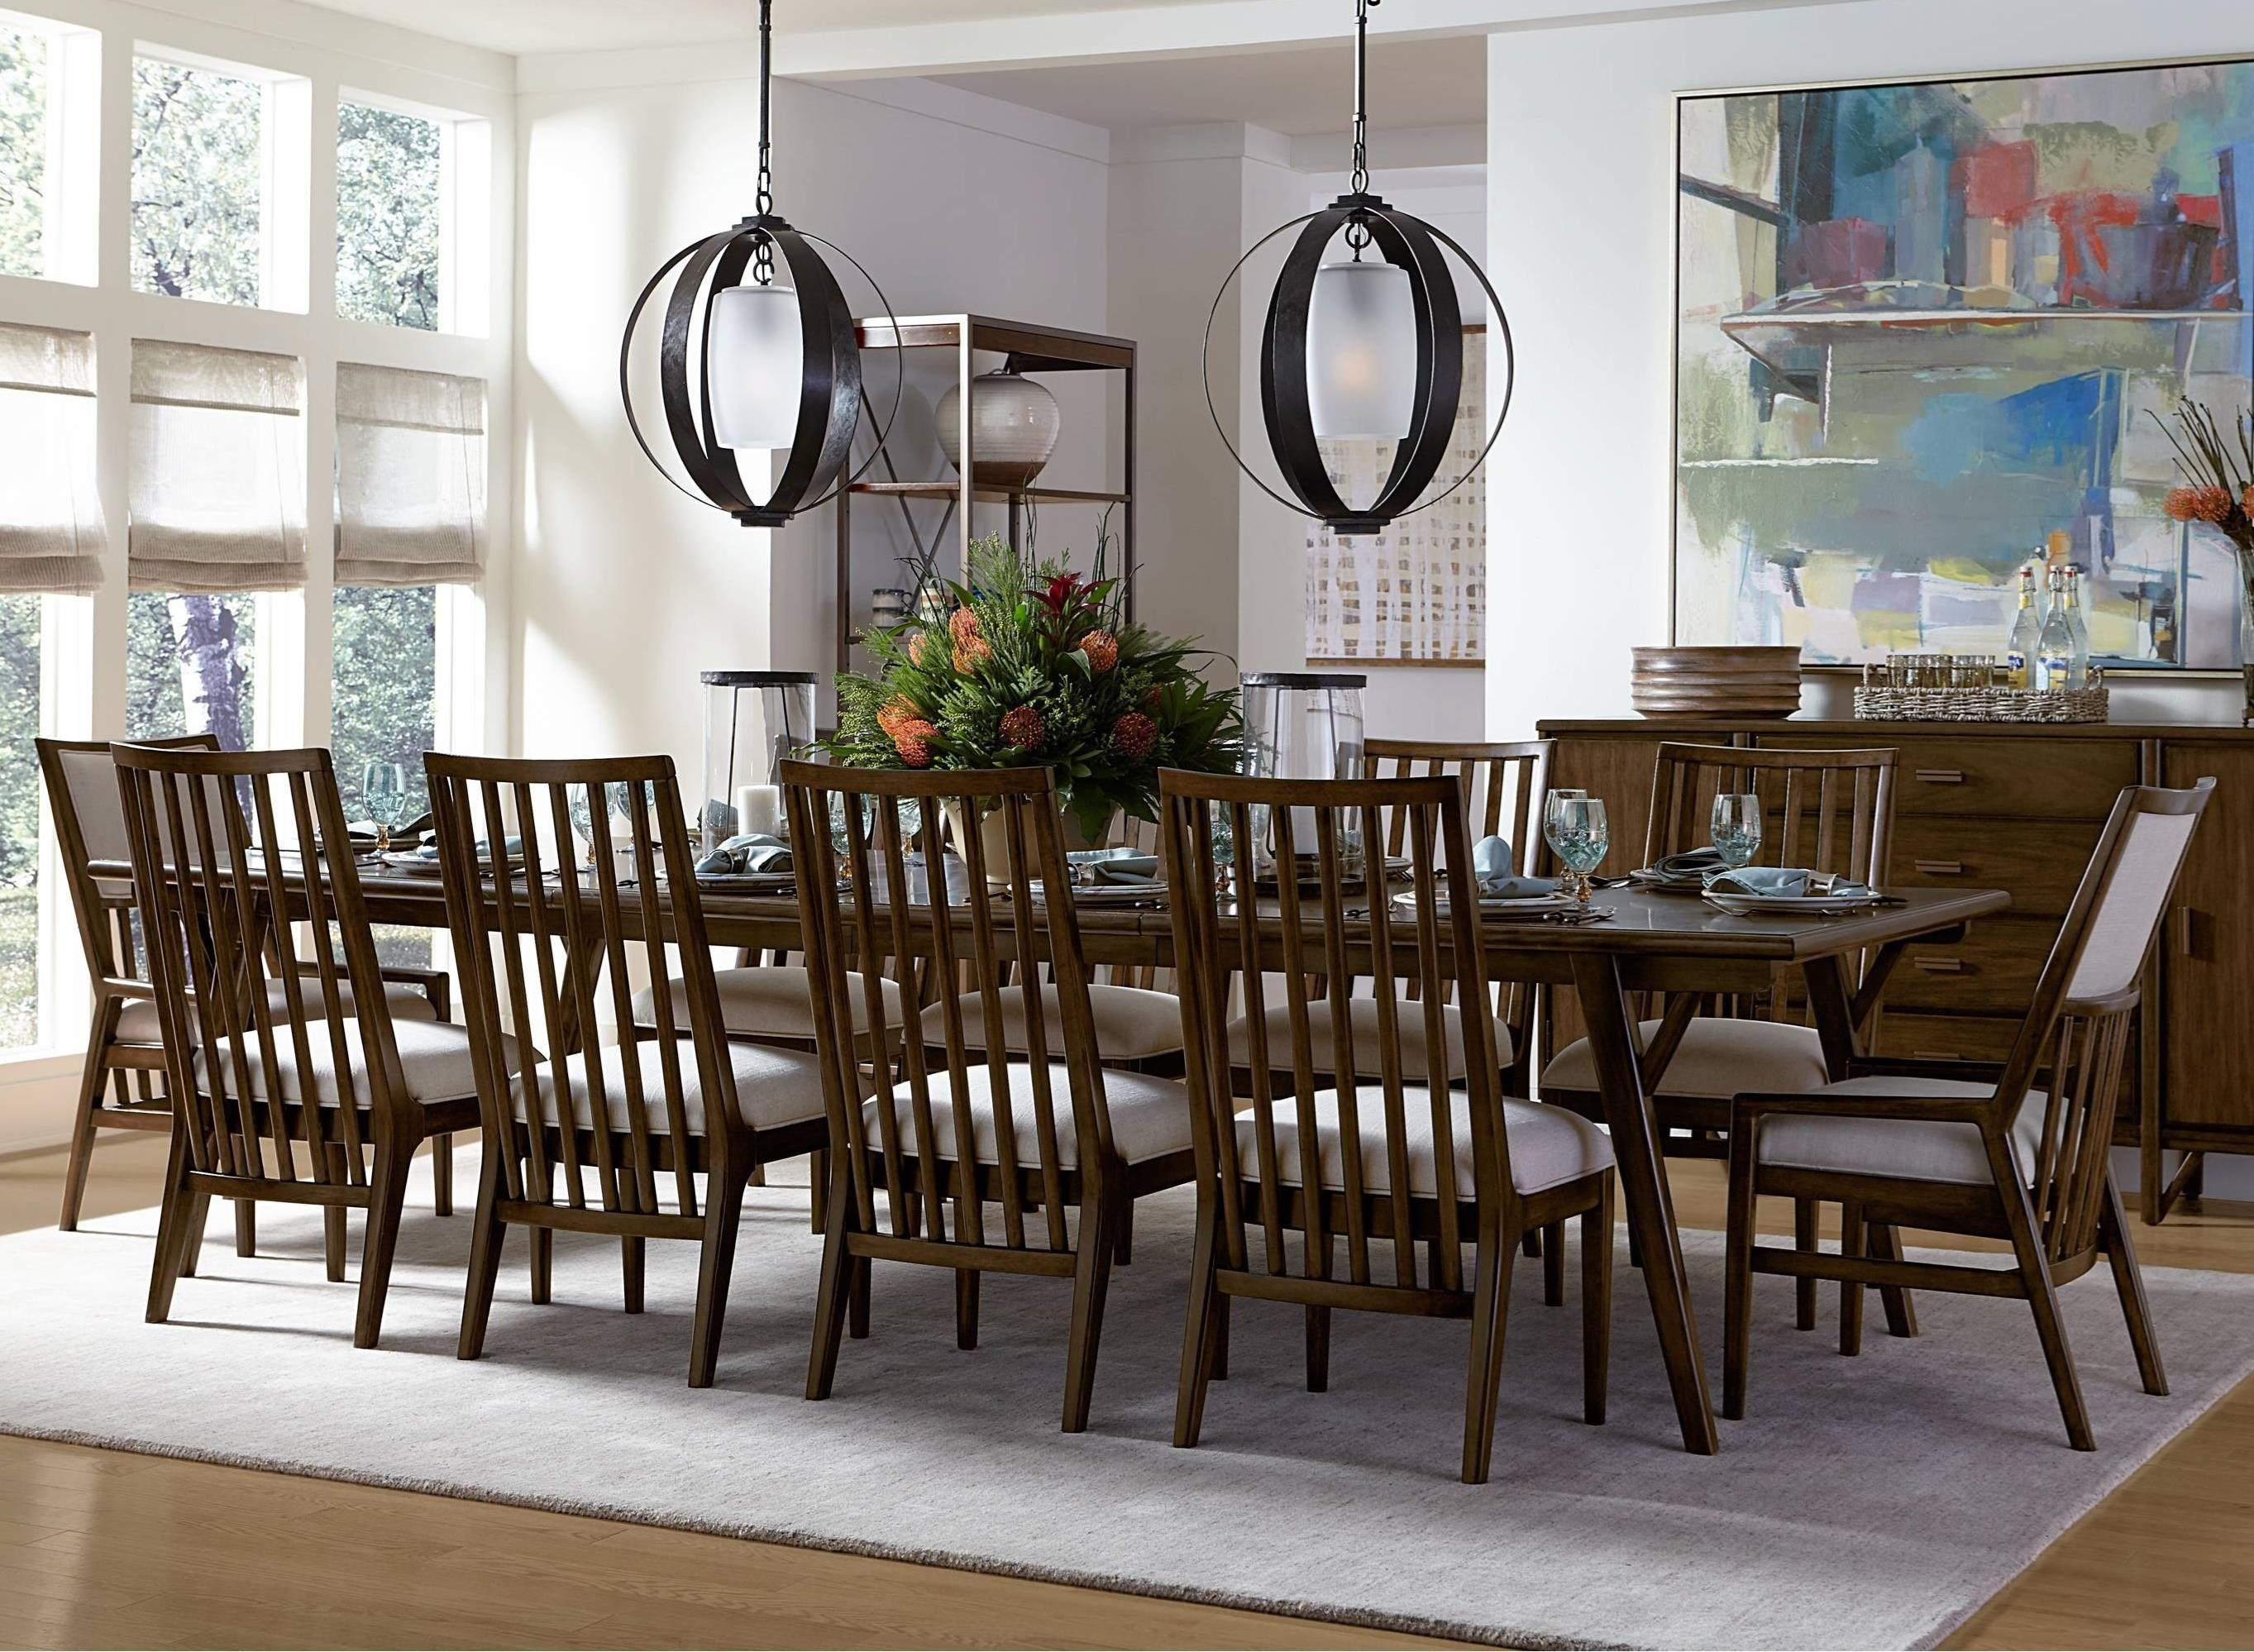 Stanley furniture santa clara 11 piece rectangular dining for 11 piece dining table